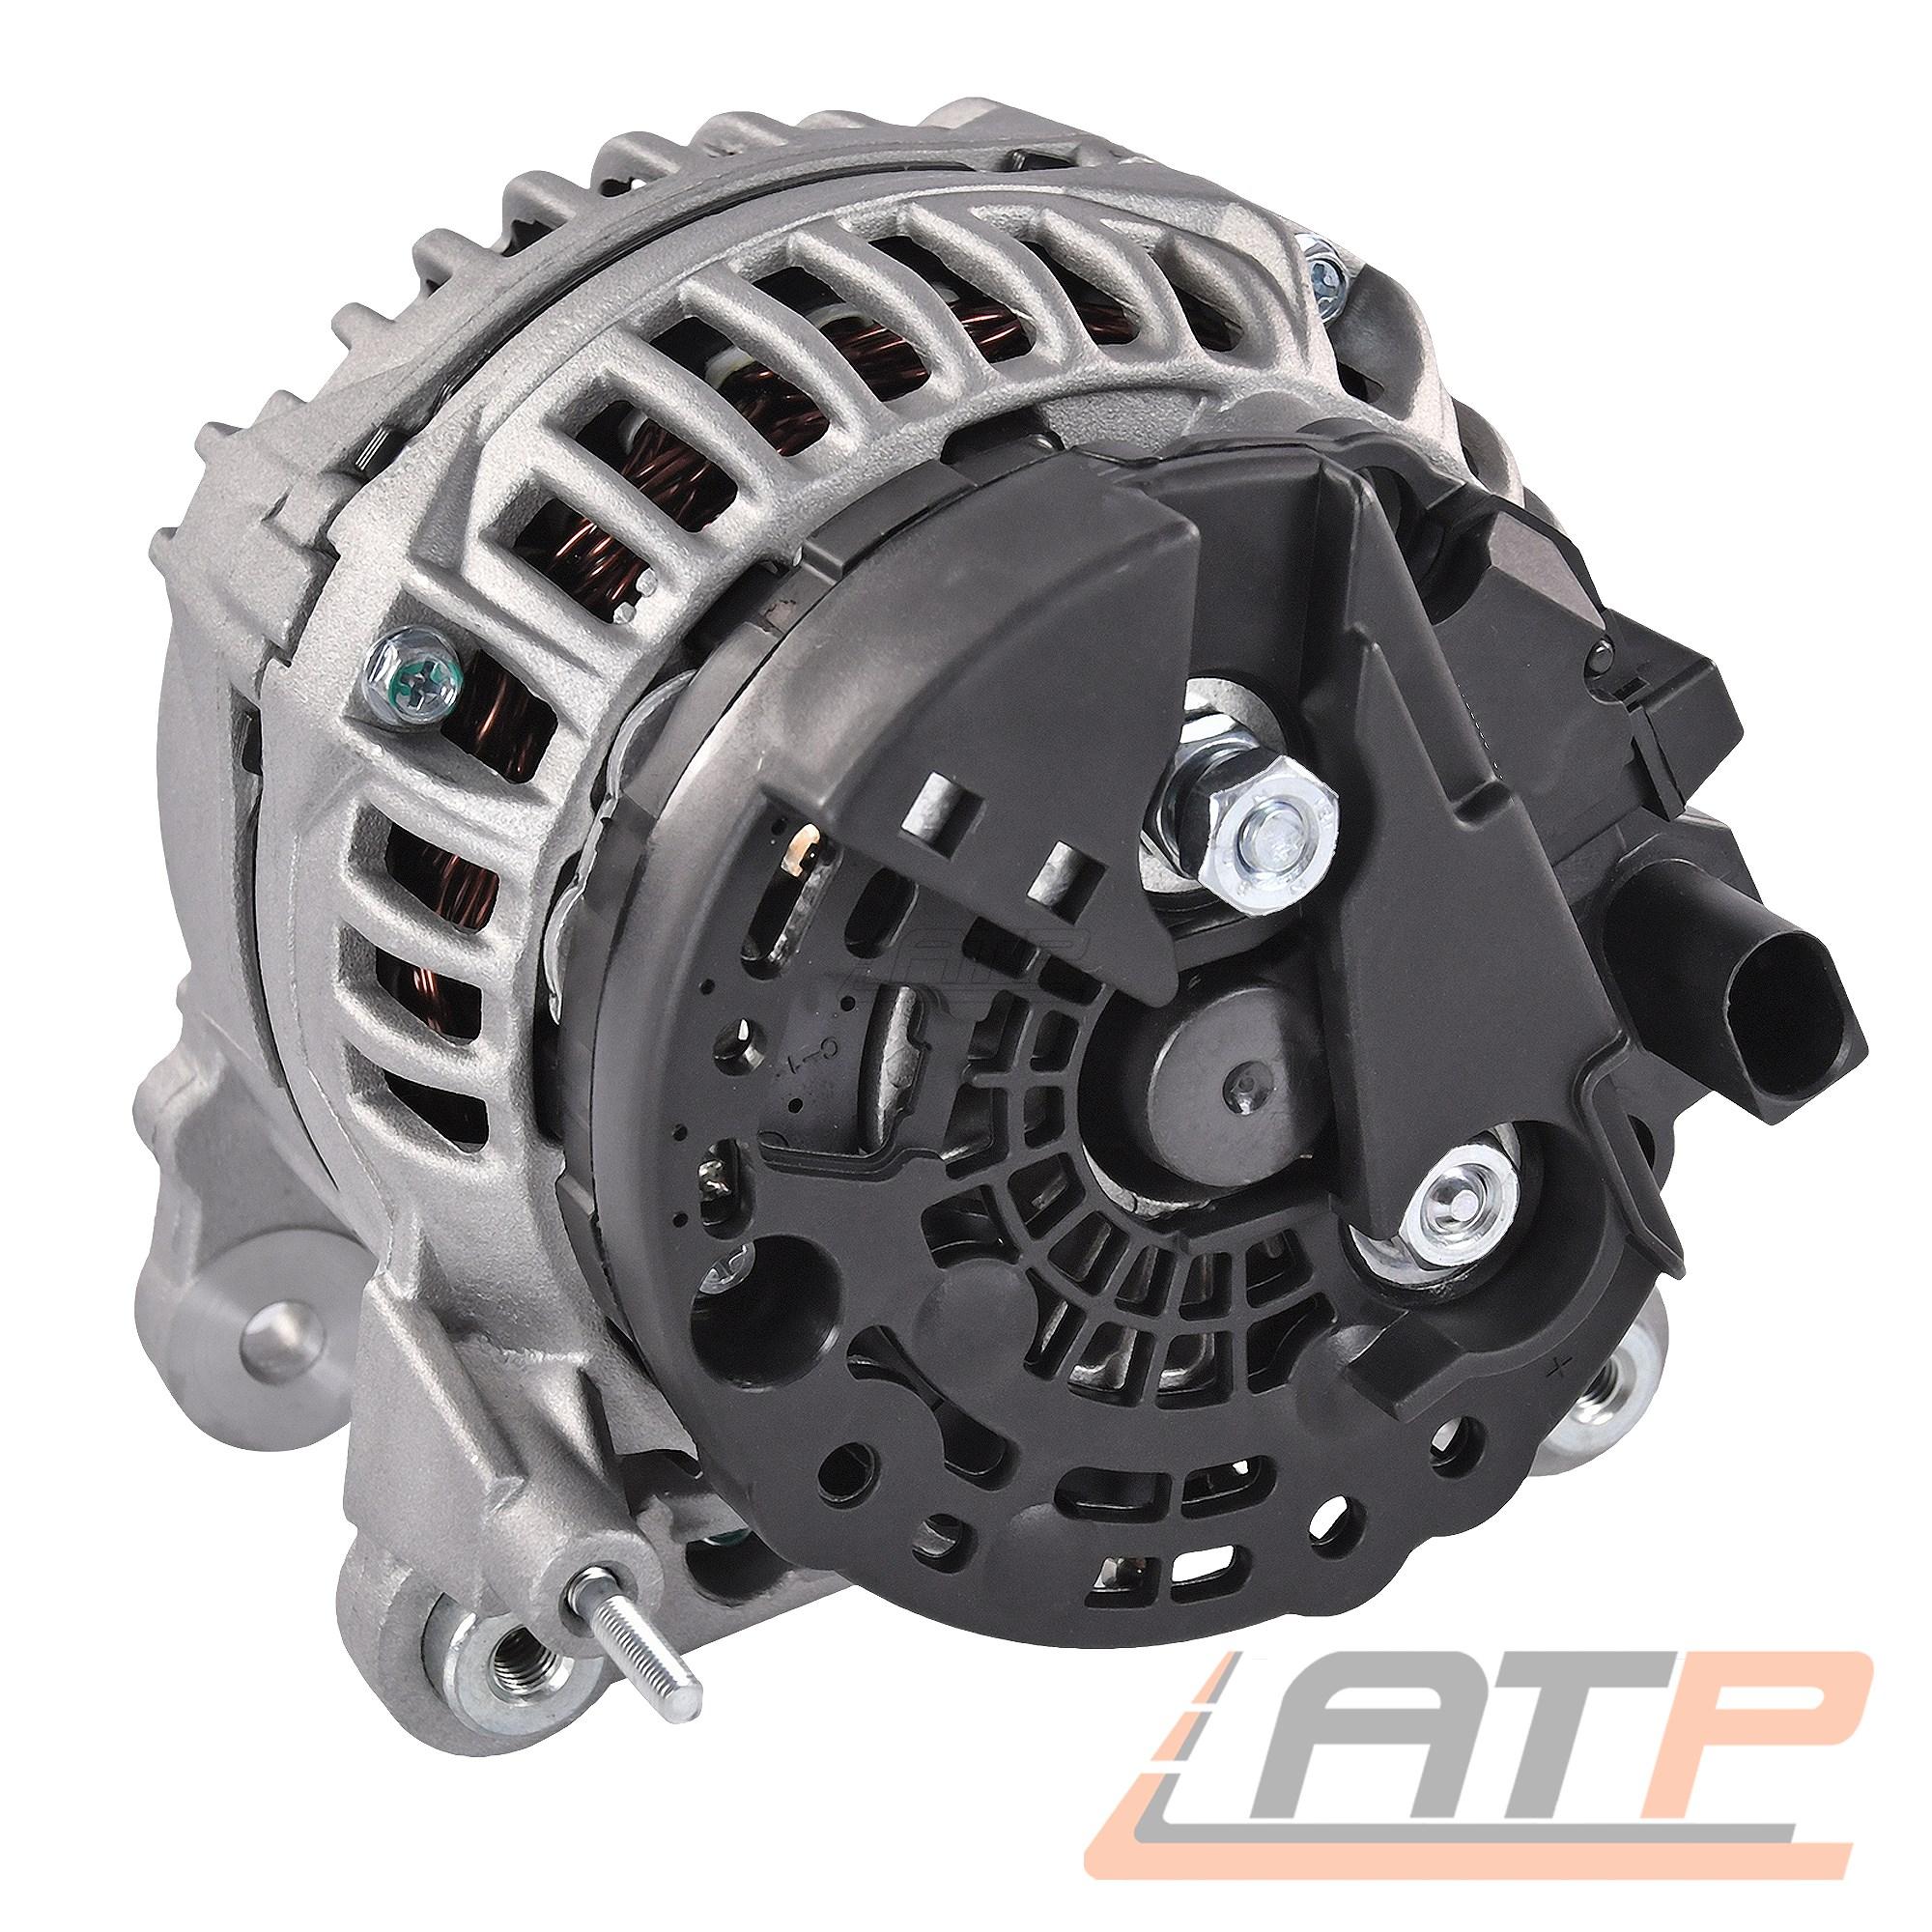 Lichtmaschine Generator 140-A Seat Alhambra 7V 1.9 2.0 Tdi Bj 00-10 3